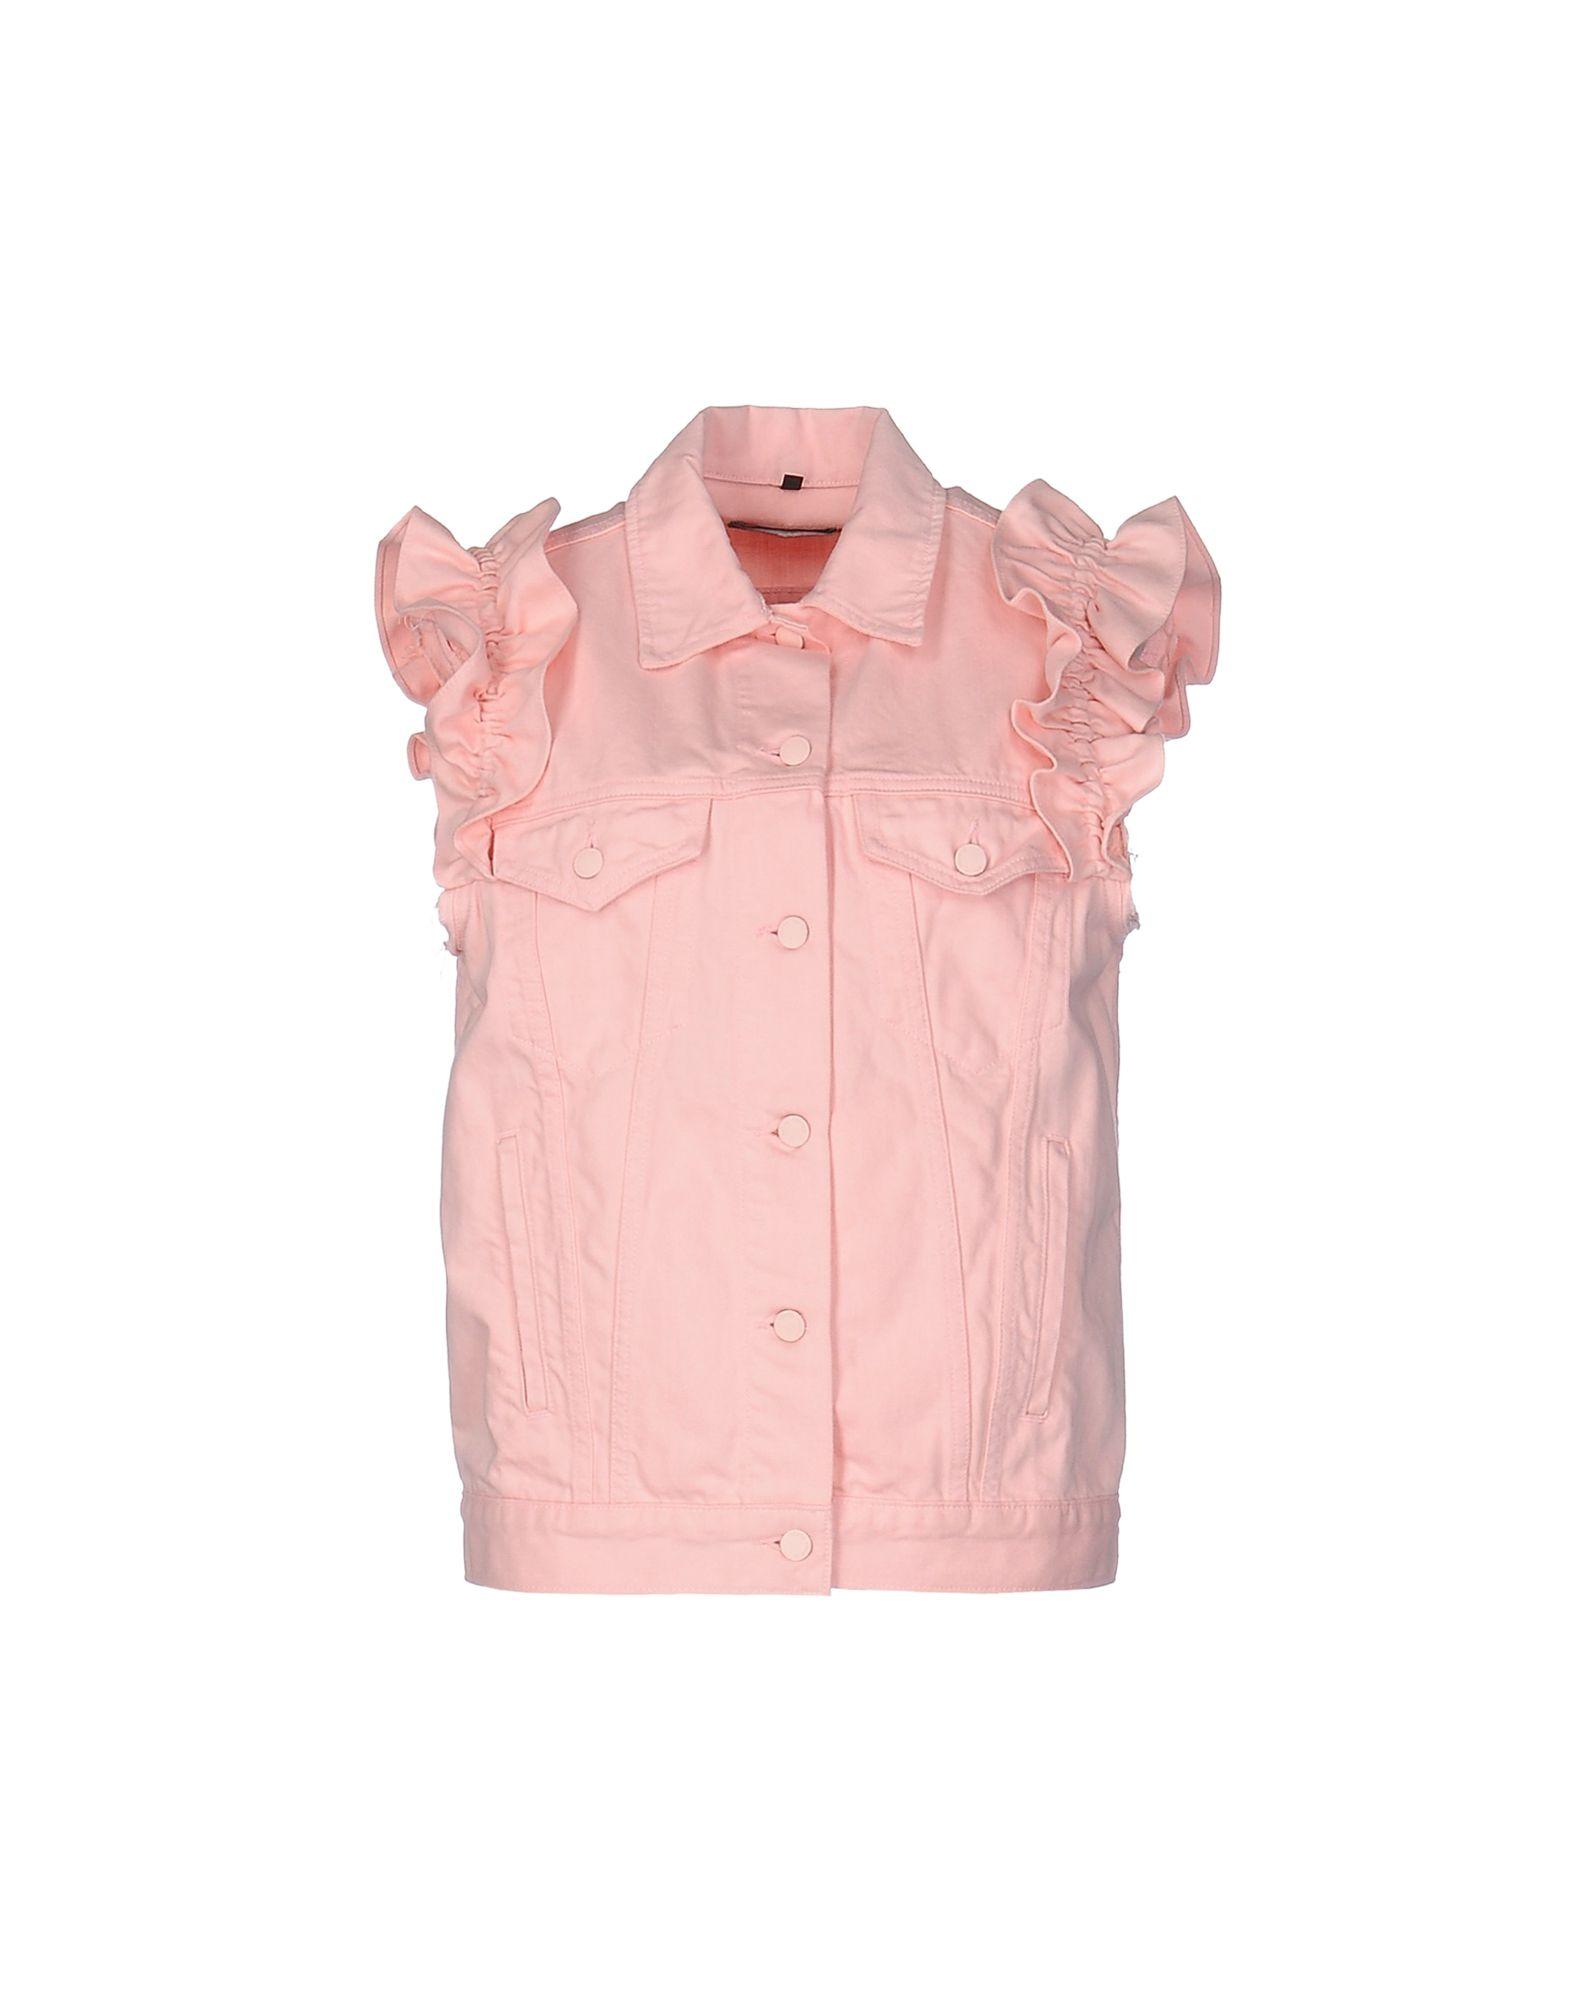 simone rocha x j brand короткое платье SIMONE ROCHA x J BRAND Джинсовая верхняя одежда